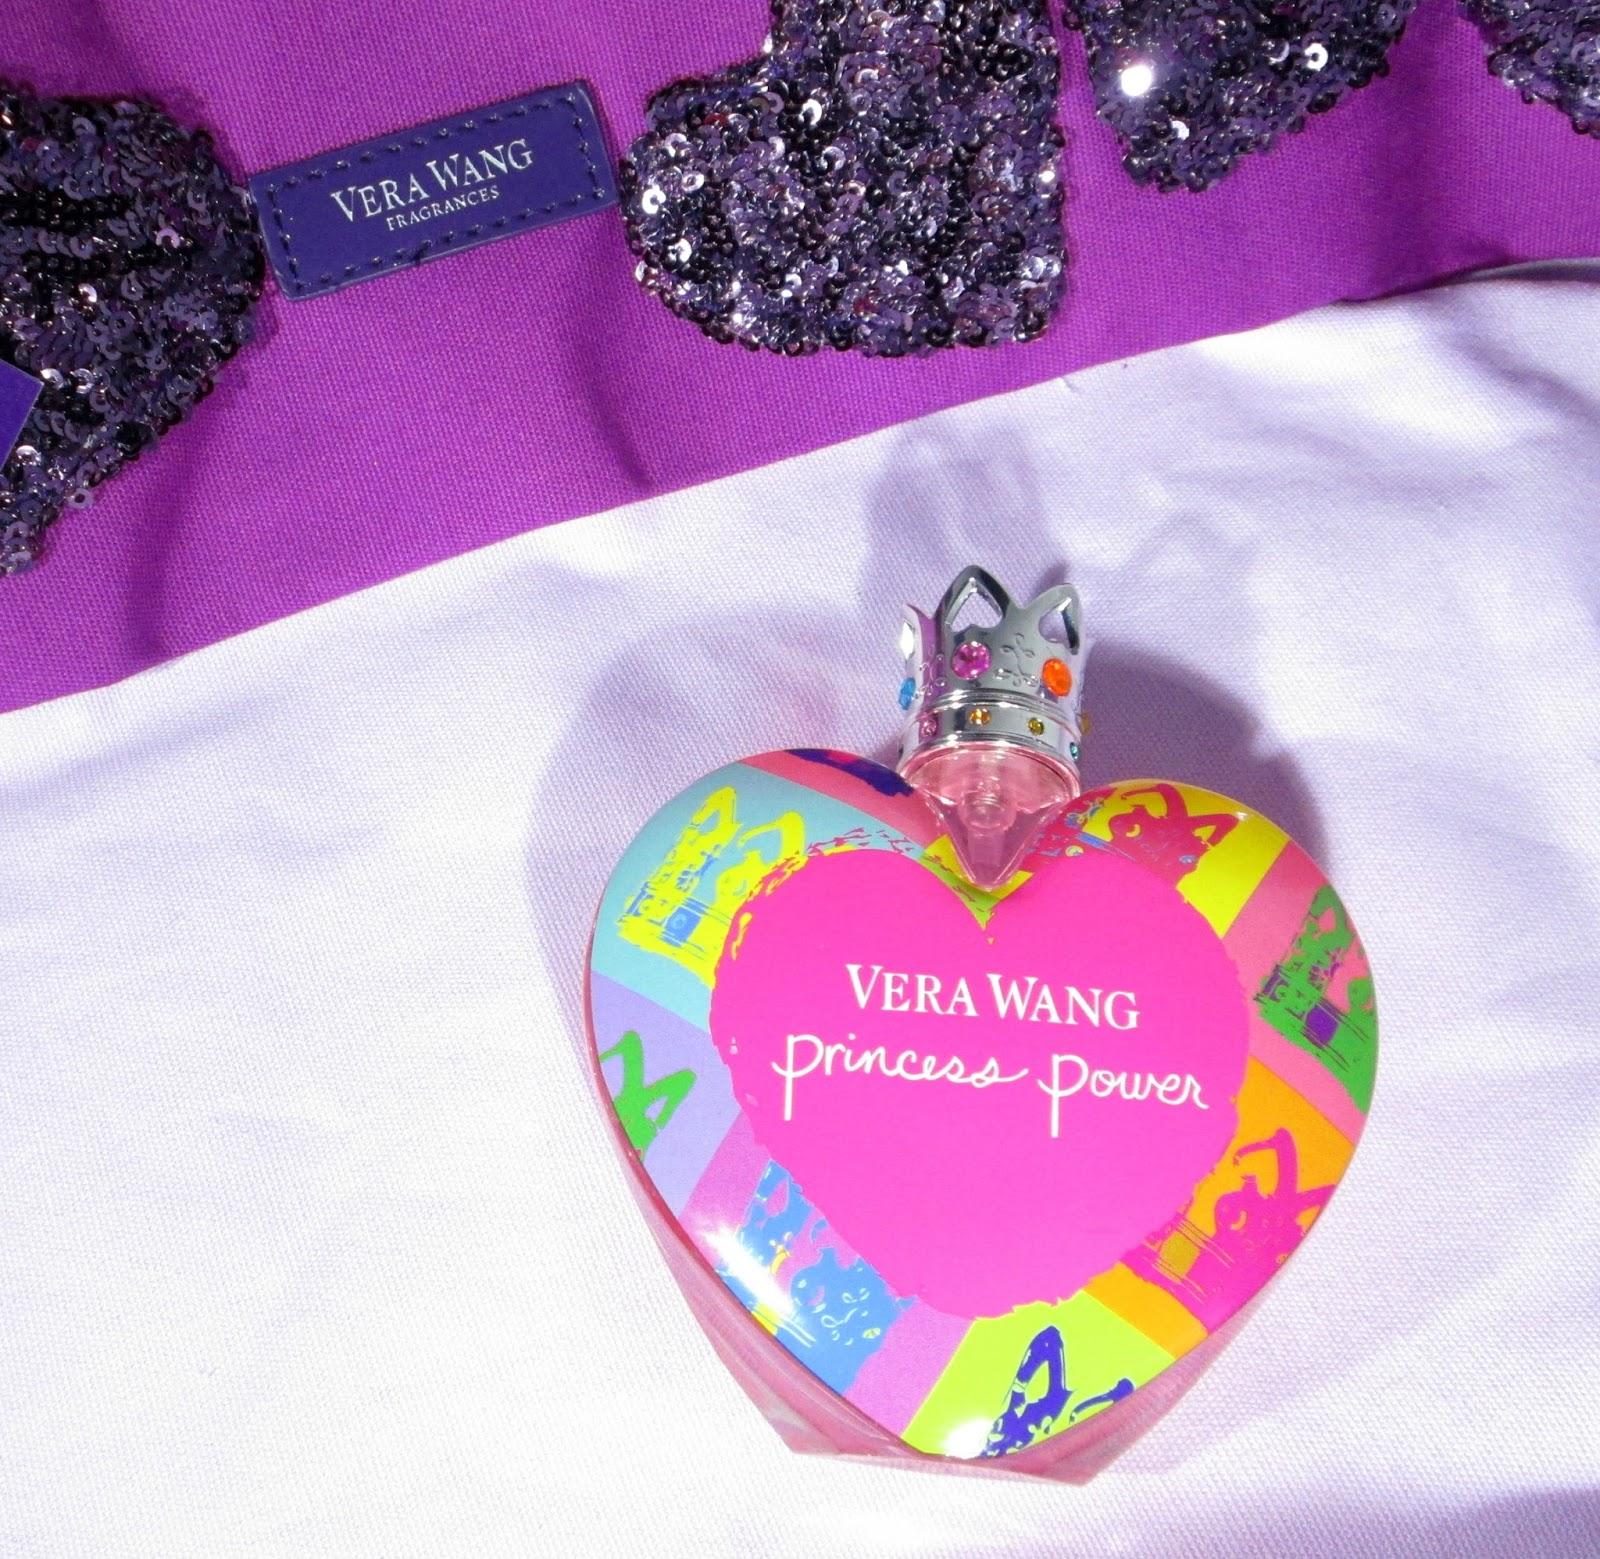 Vera wangs princess power is the third instalment in the princess